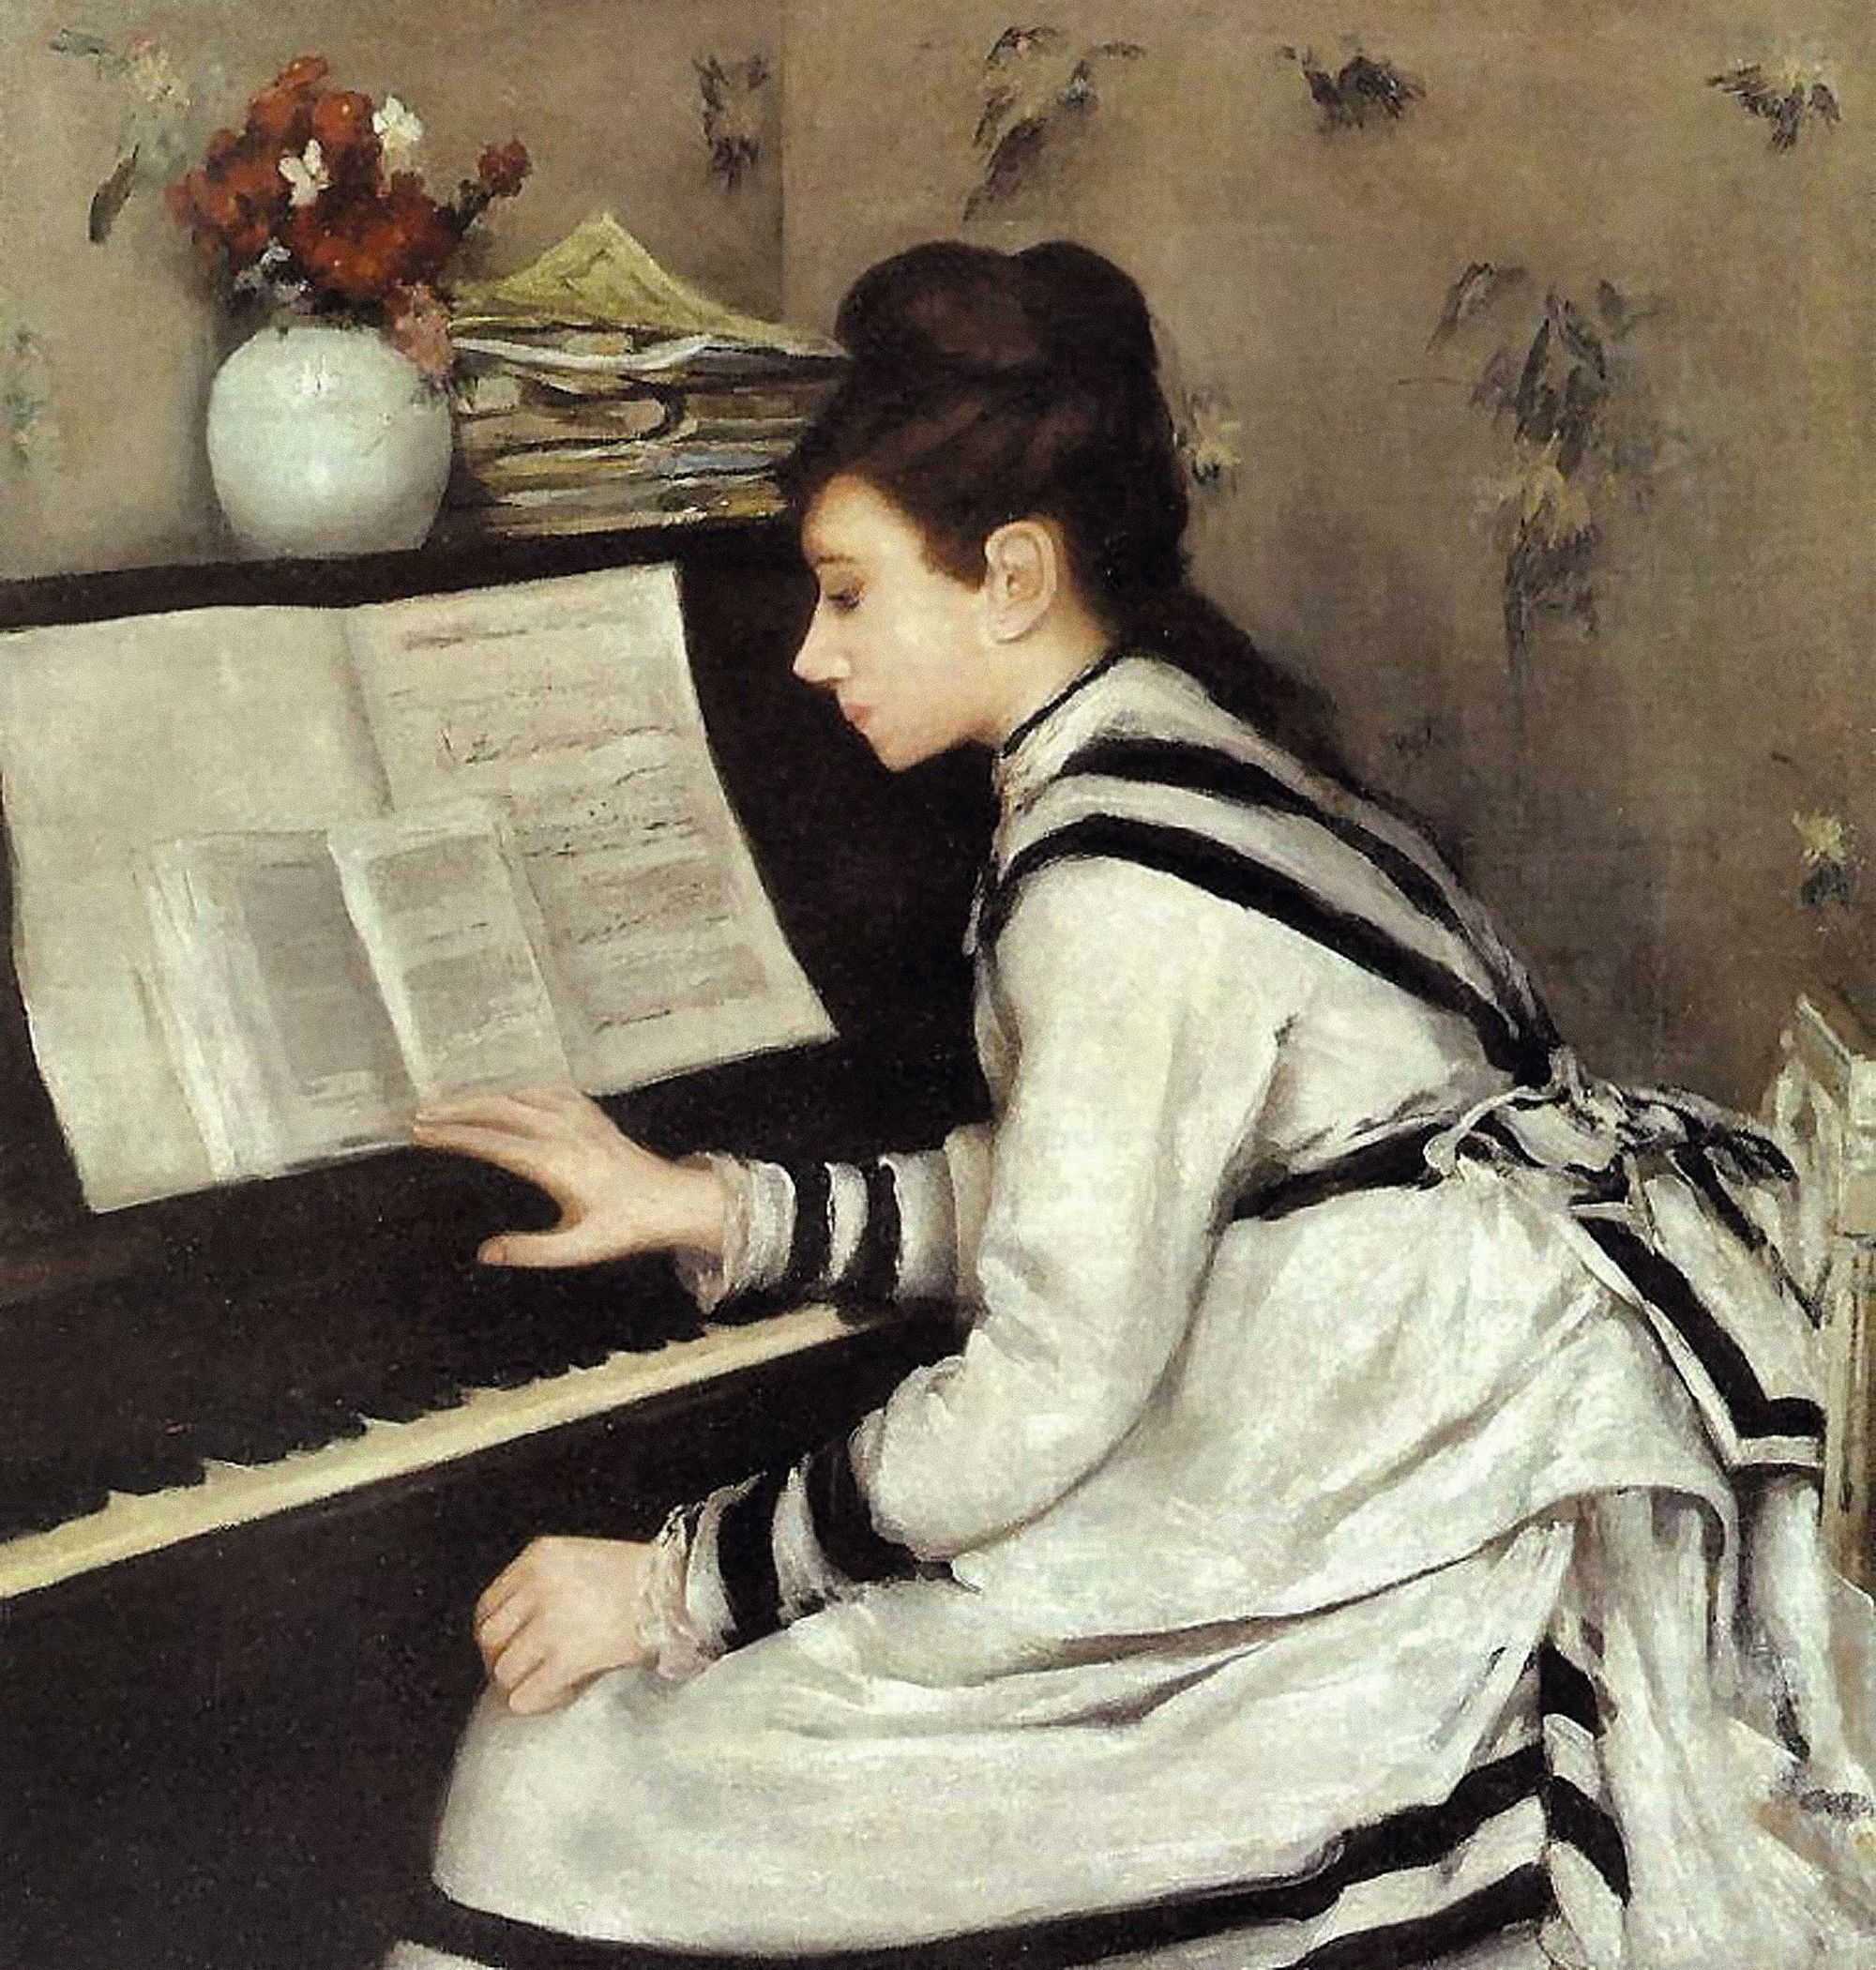 Eva Gonzales, Secrètement, 1878